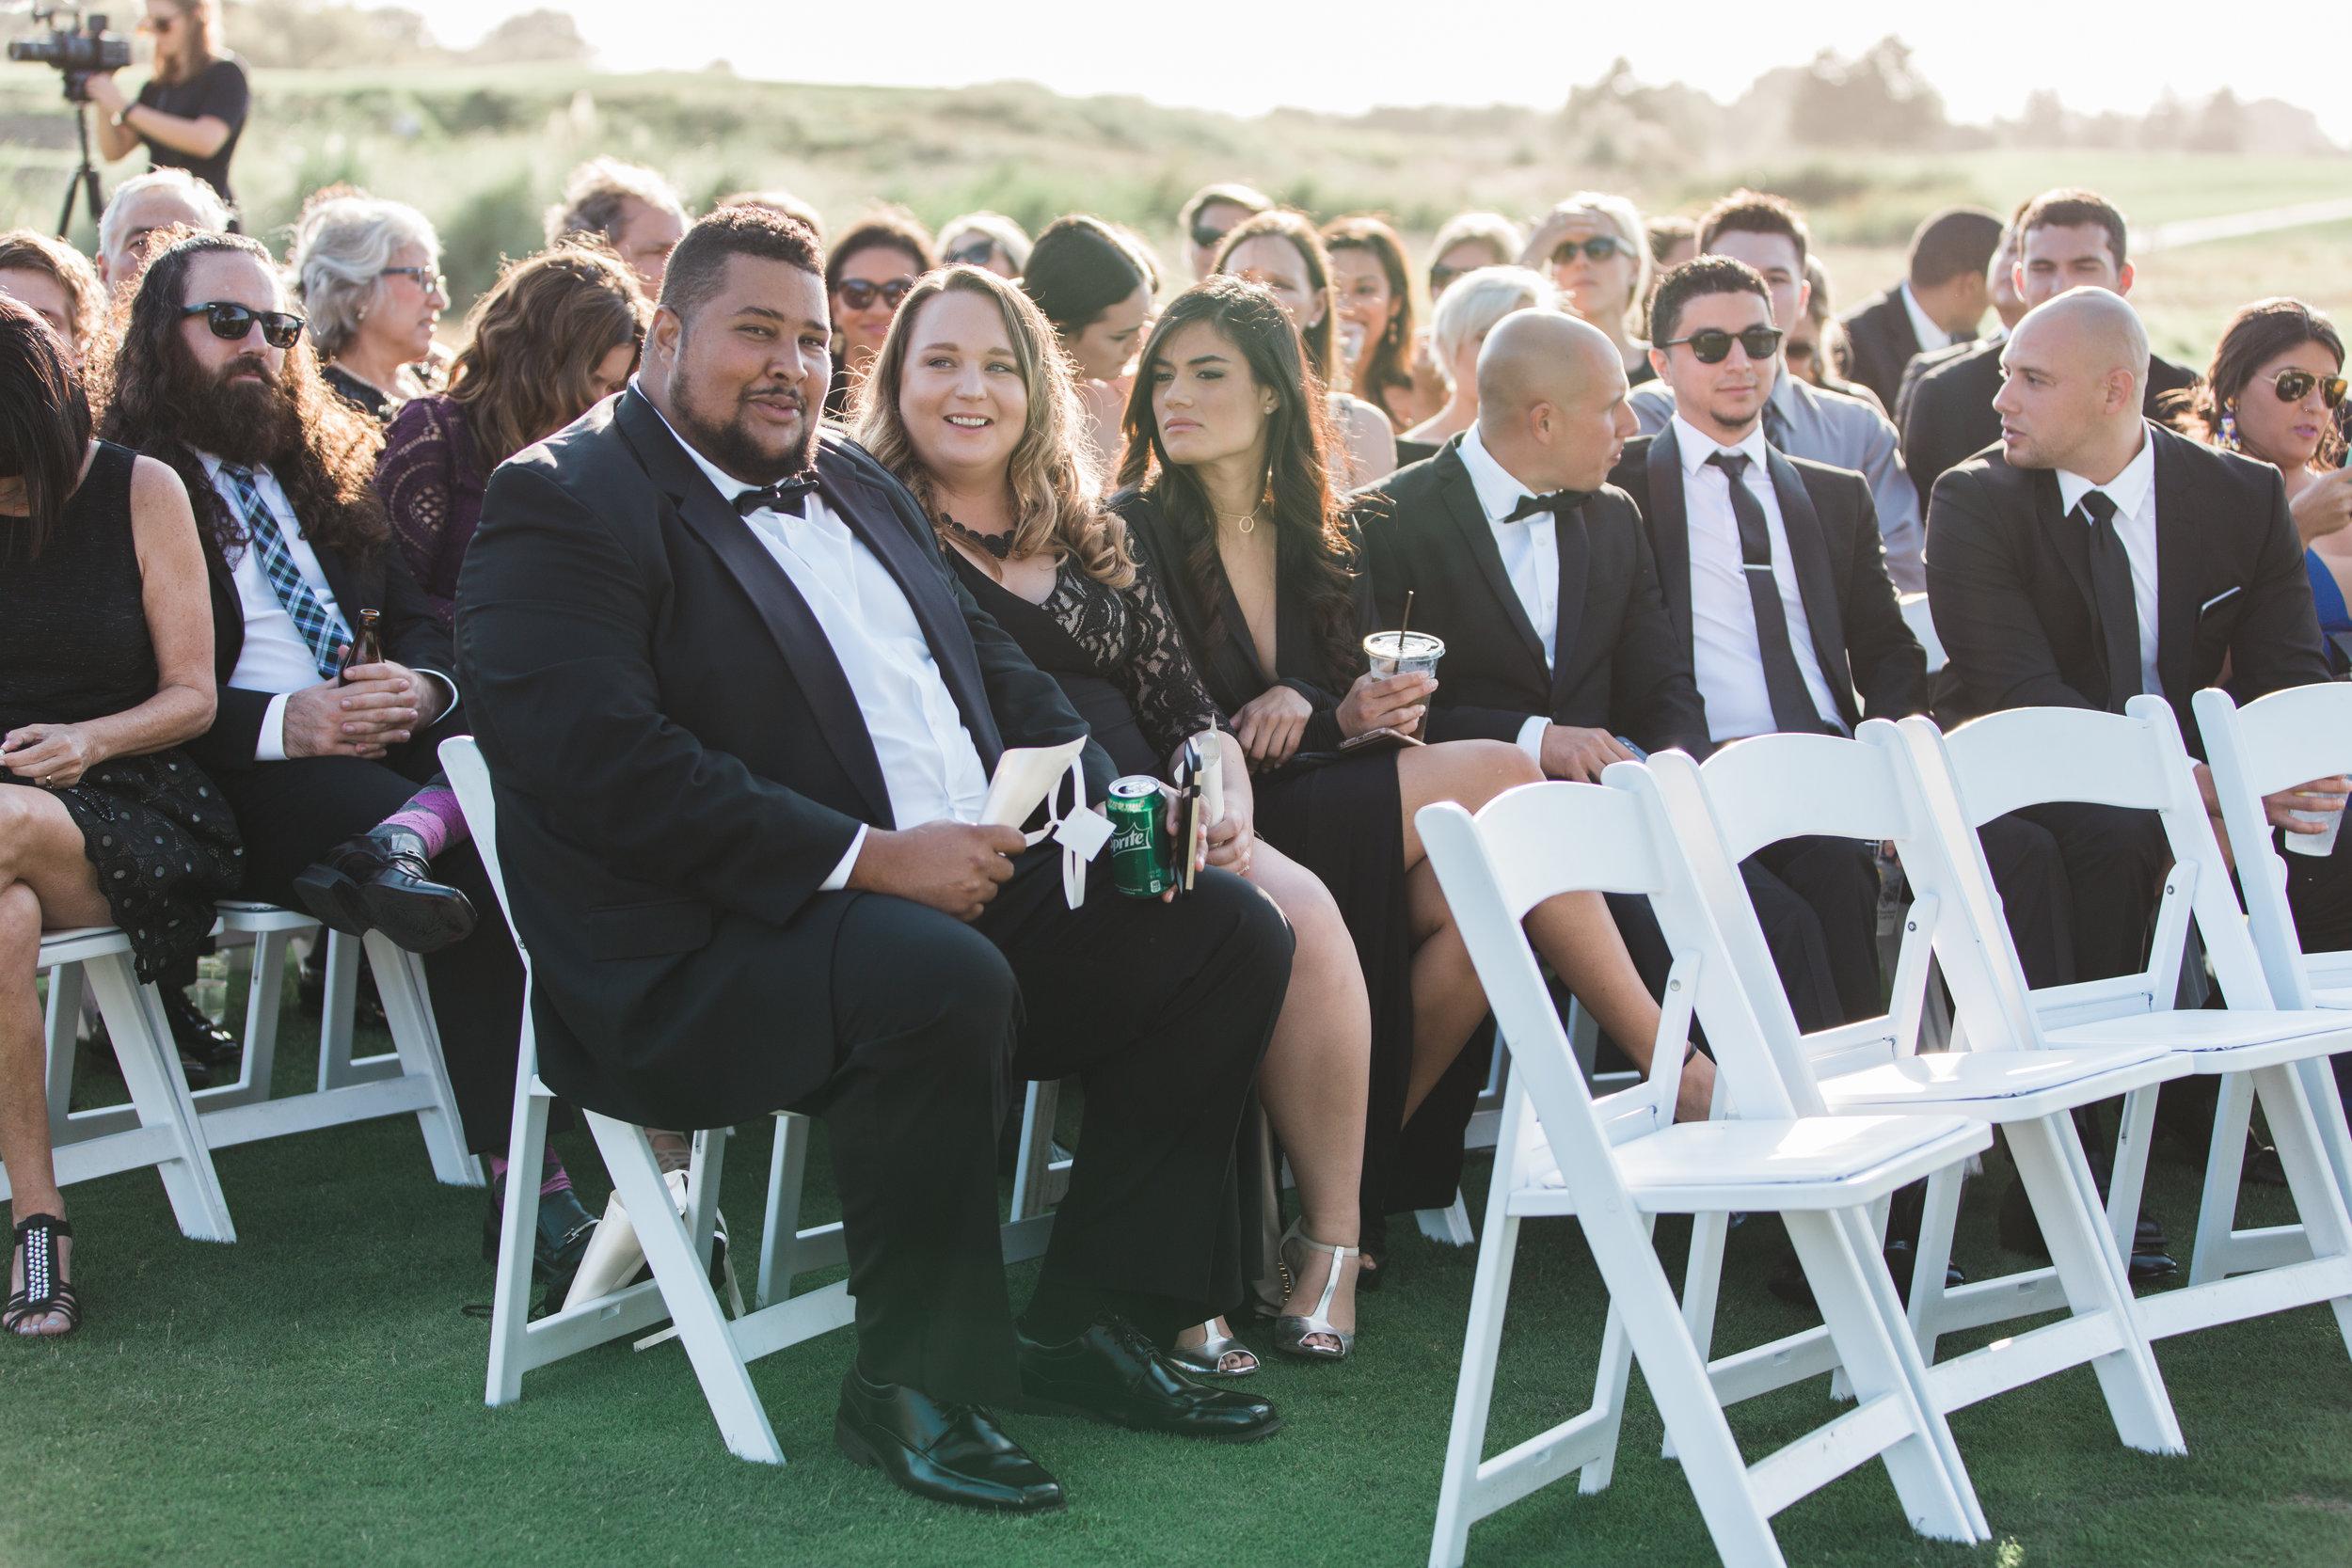 jenny-and-george-wedding-roque-events-meyerott-photography 671.jpg